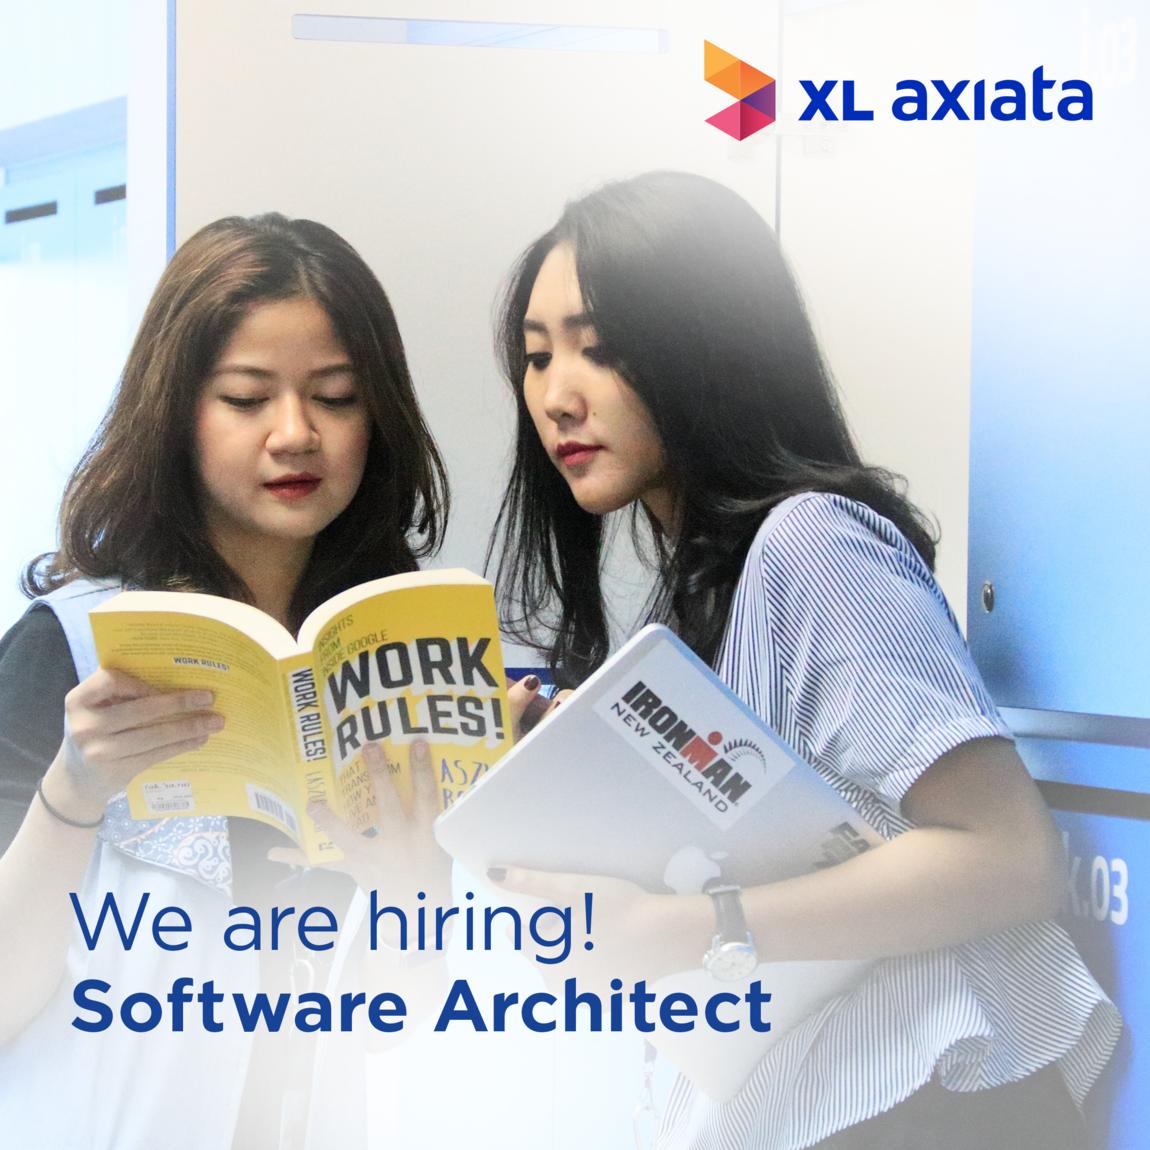 XL Axiata_Software Architect